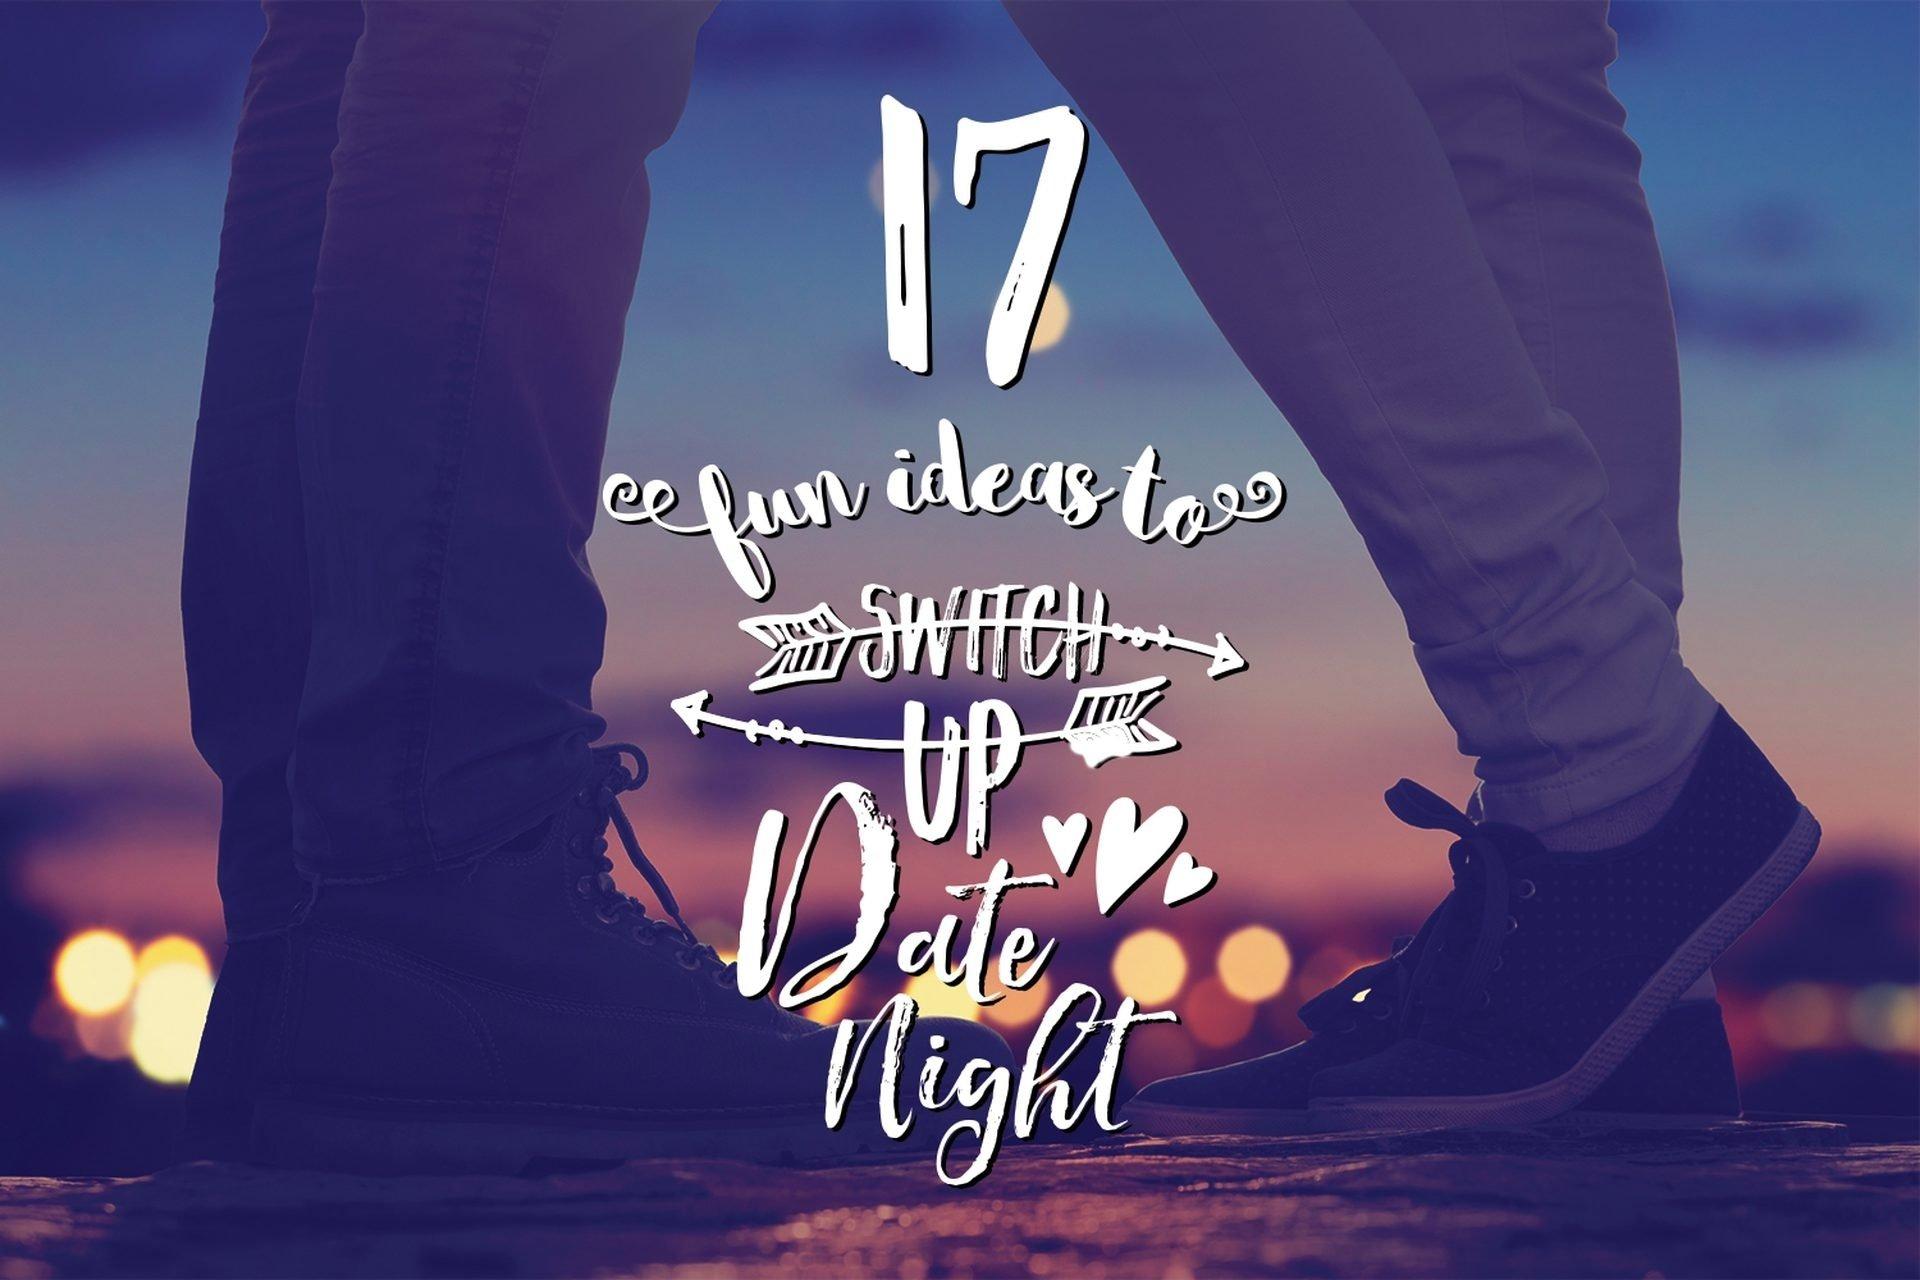 10 Stylish Fun Date Ideas San Diego 17 fun ideas to shake up date night livestrong 1 2021